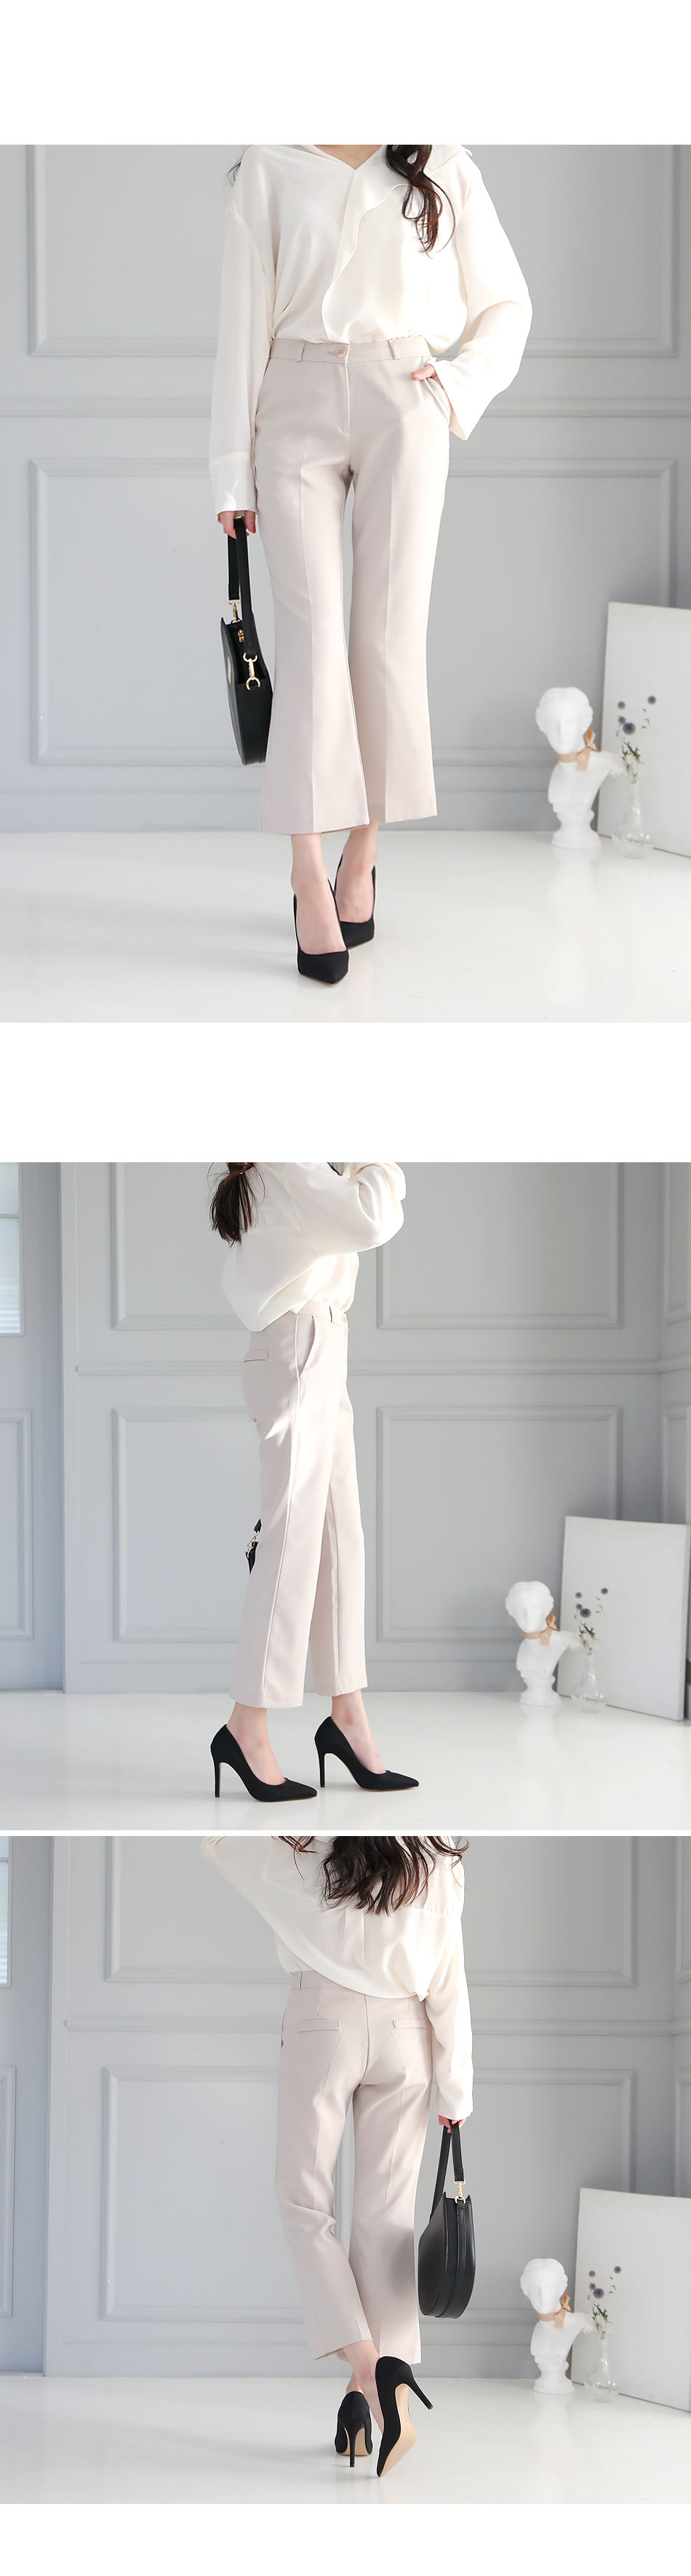 Elon's Stiletto Heel 10cm